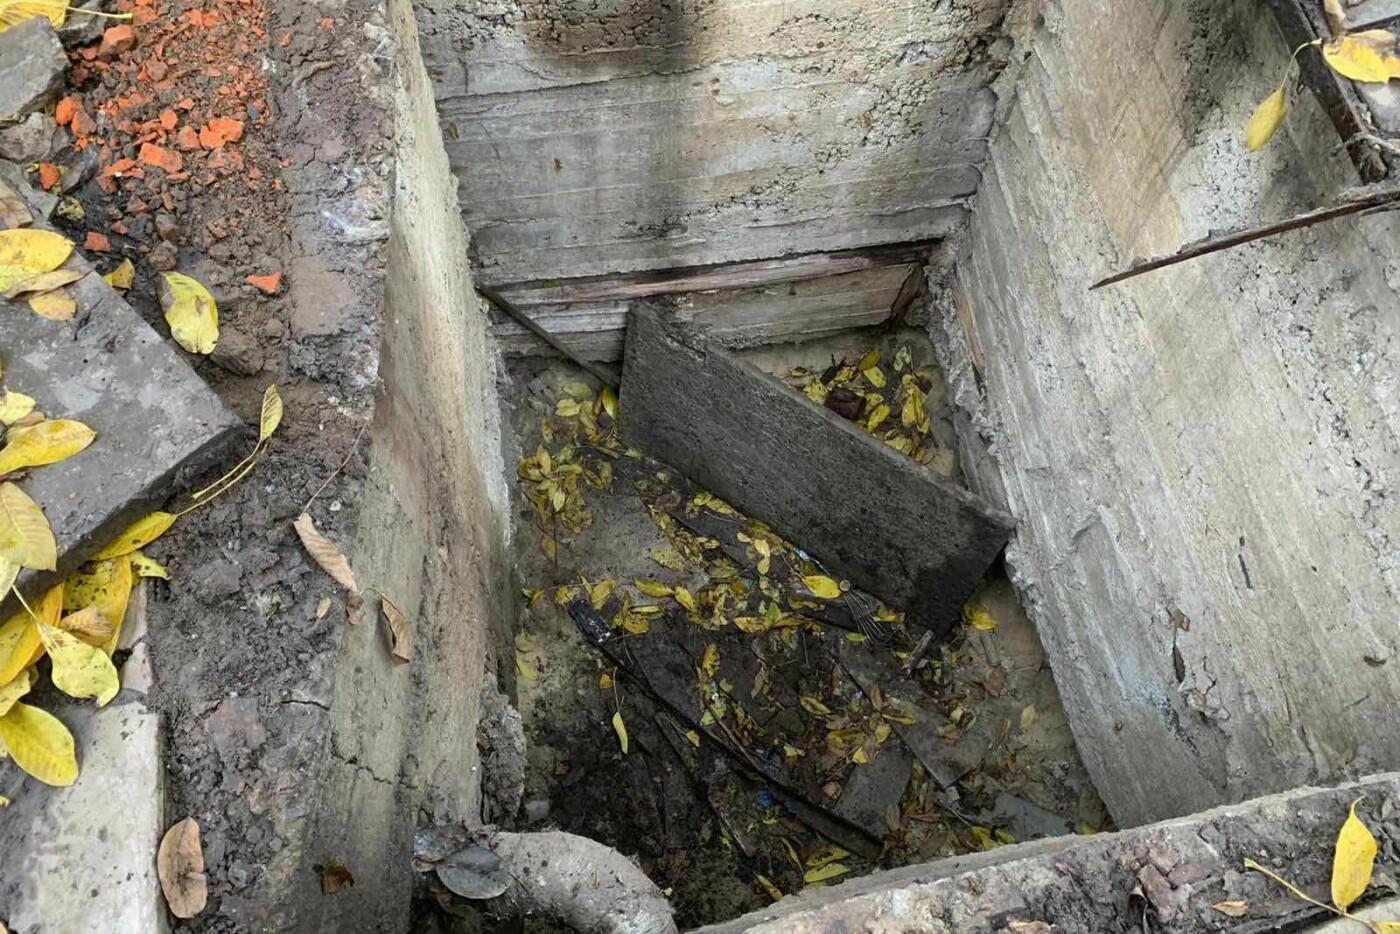 Ноги зажало обломками плиты: в Харькове пенсионерка упала в бетонную яму, - ФОТО, фото-2